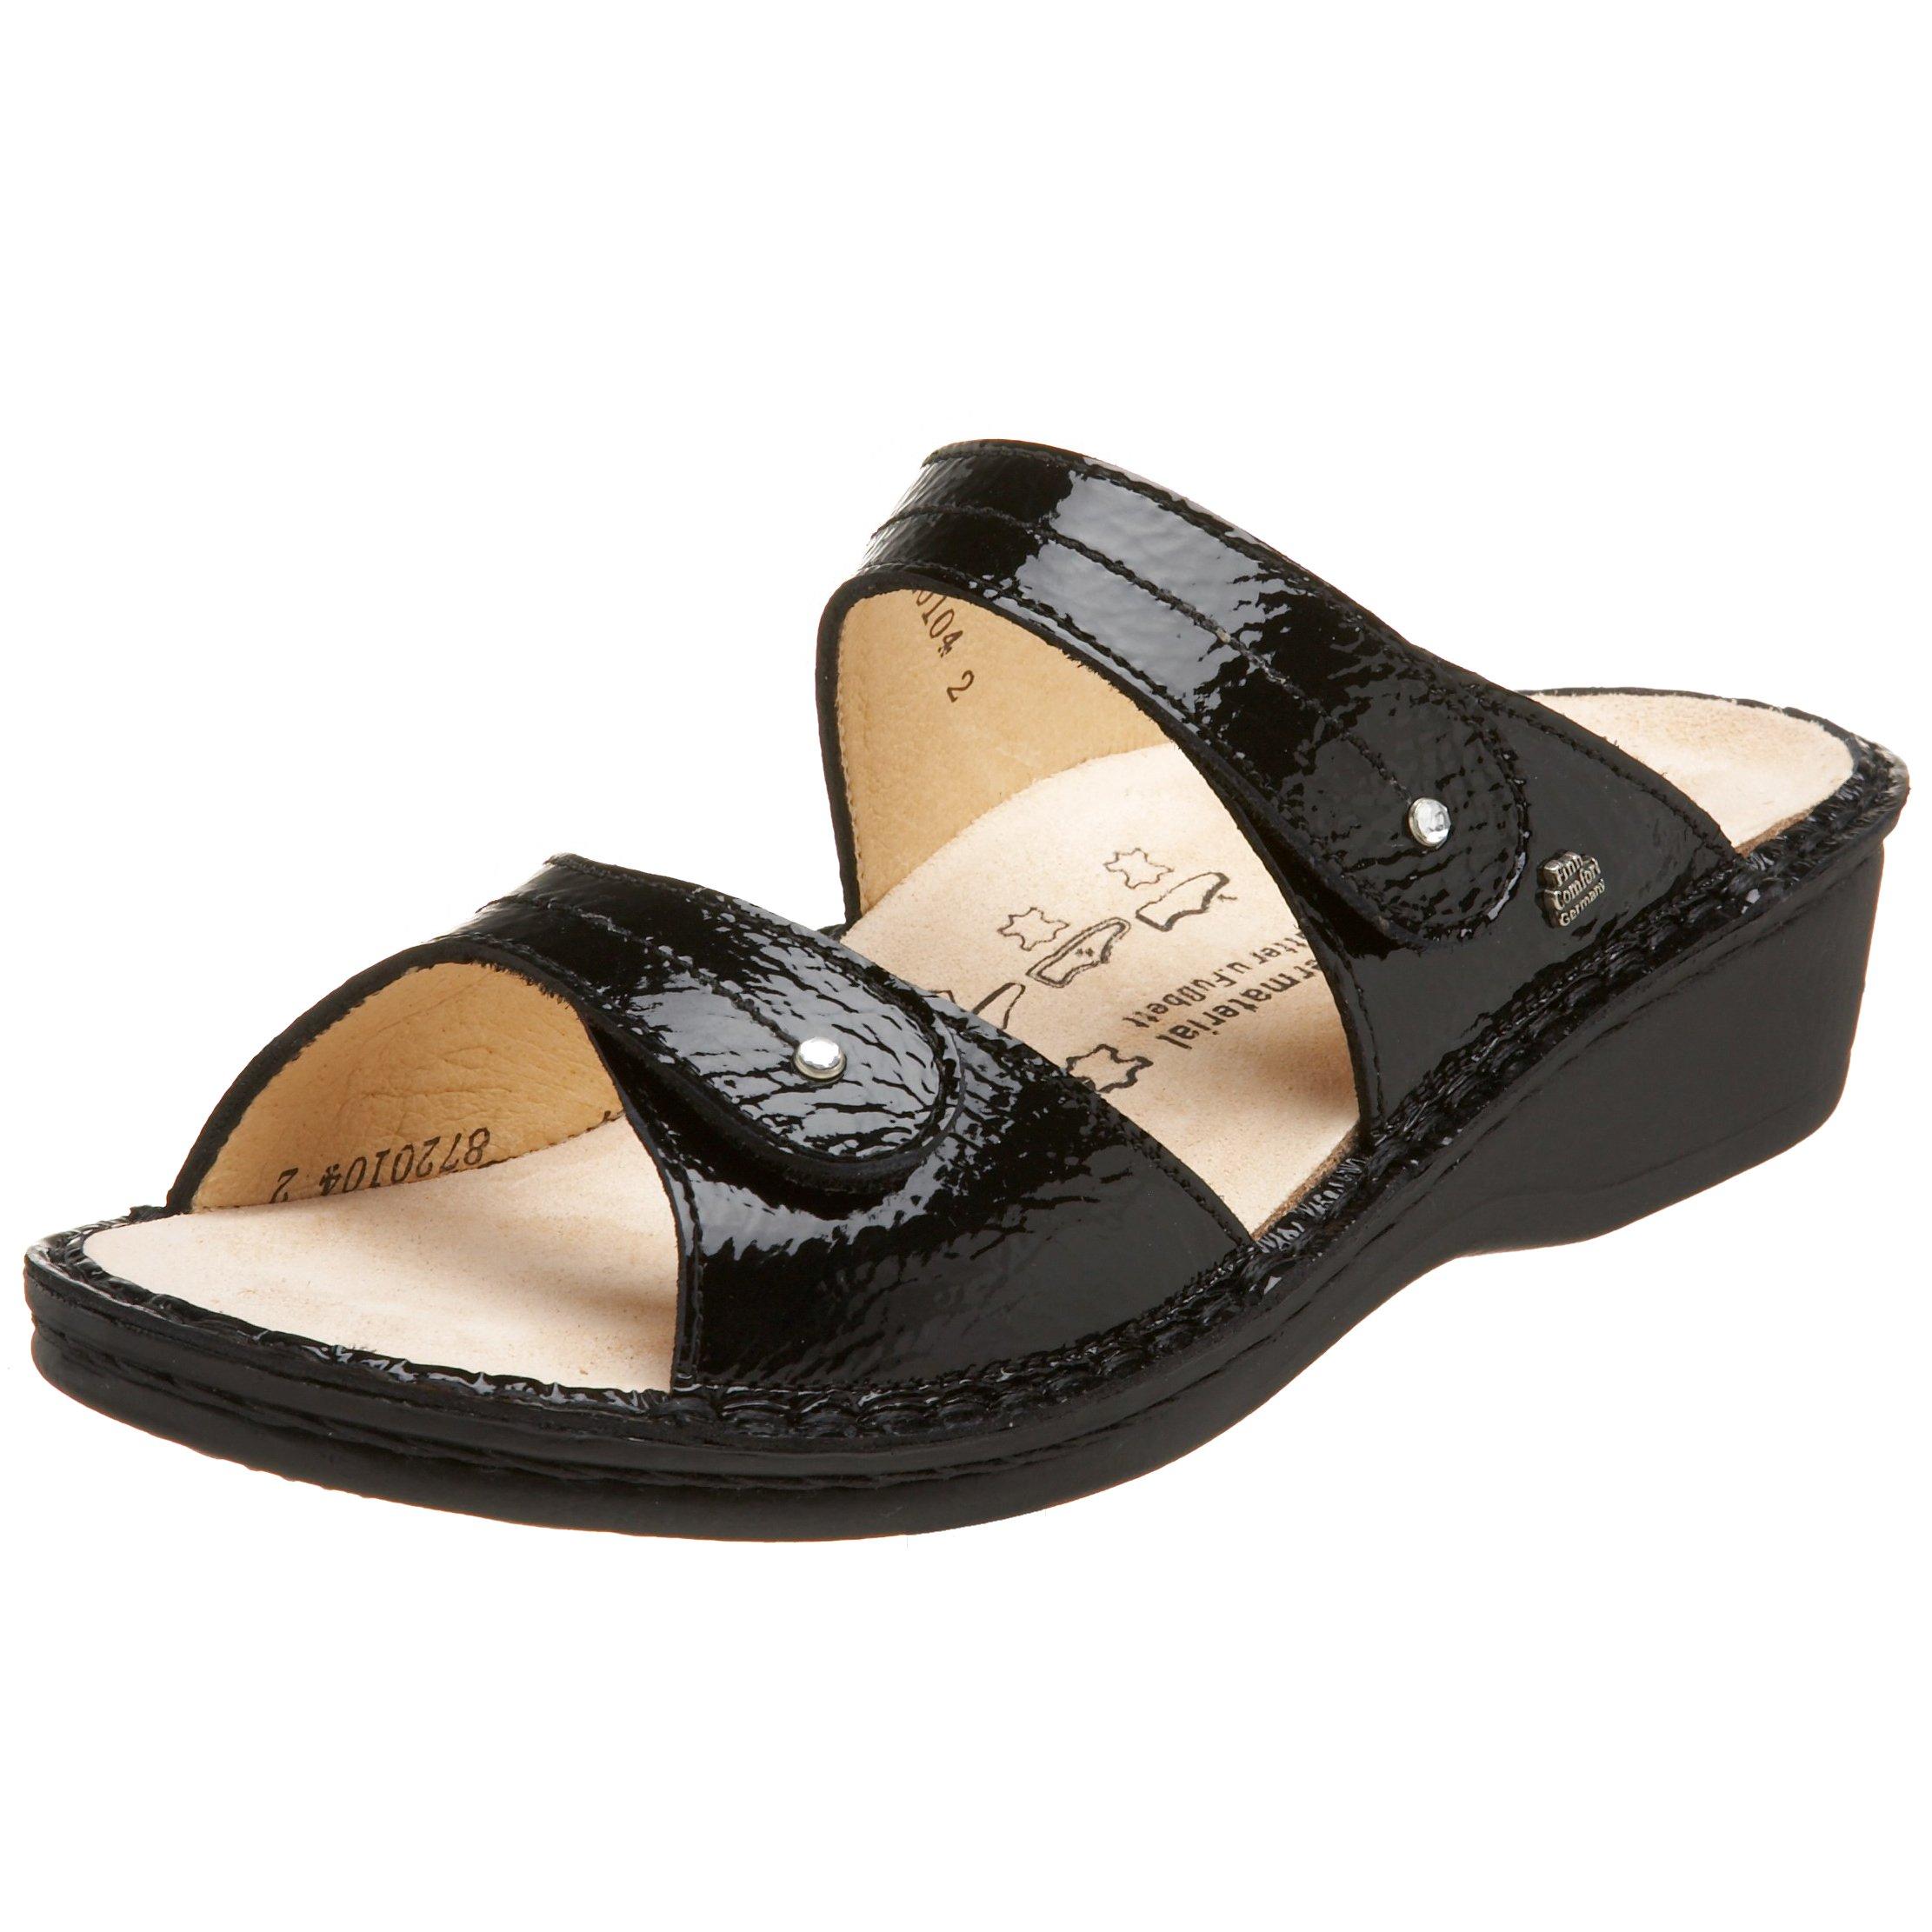 Finn Comfort Women's Catalina Soft Sandal,Black Patent,39 EU (US Women's 8 M)